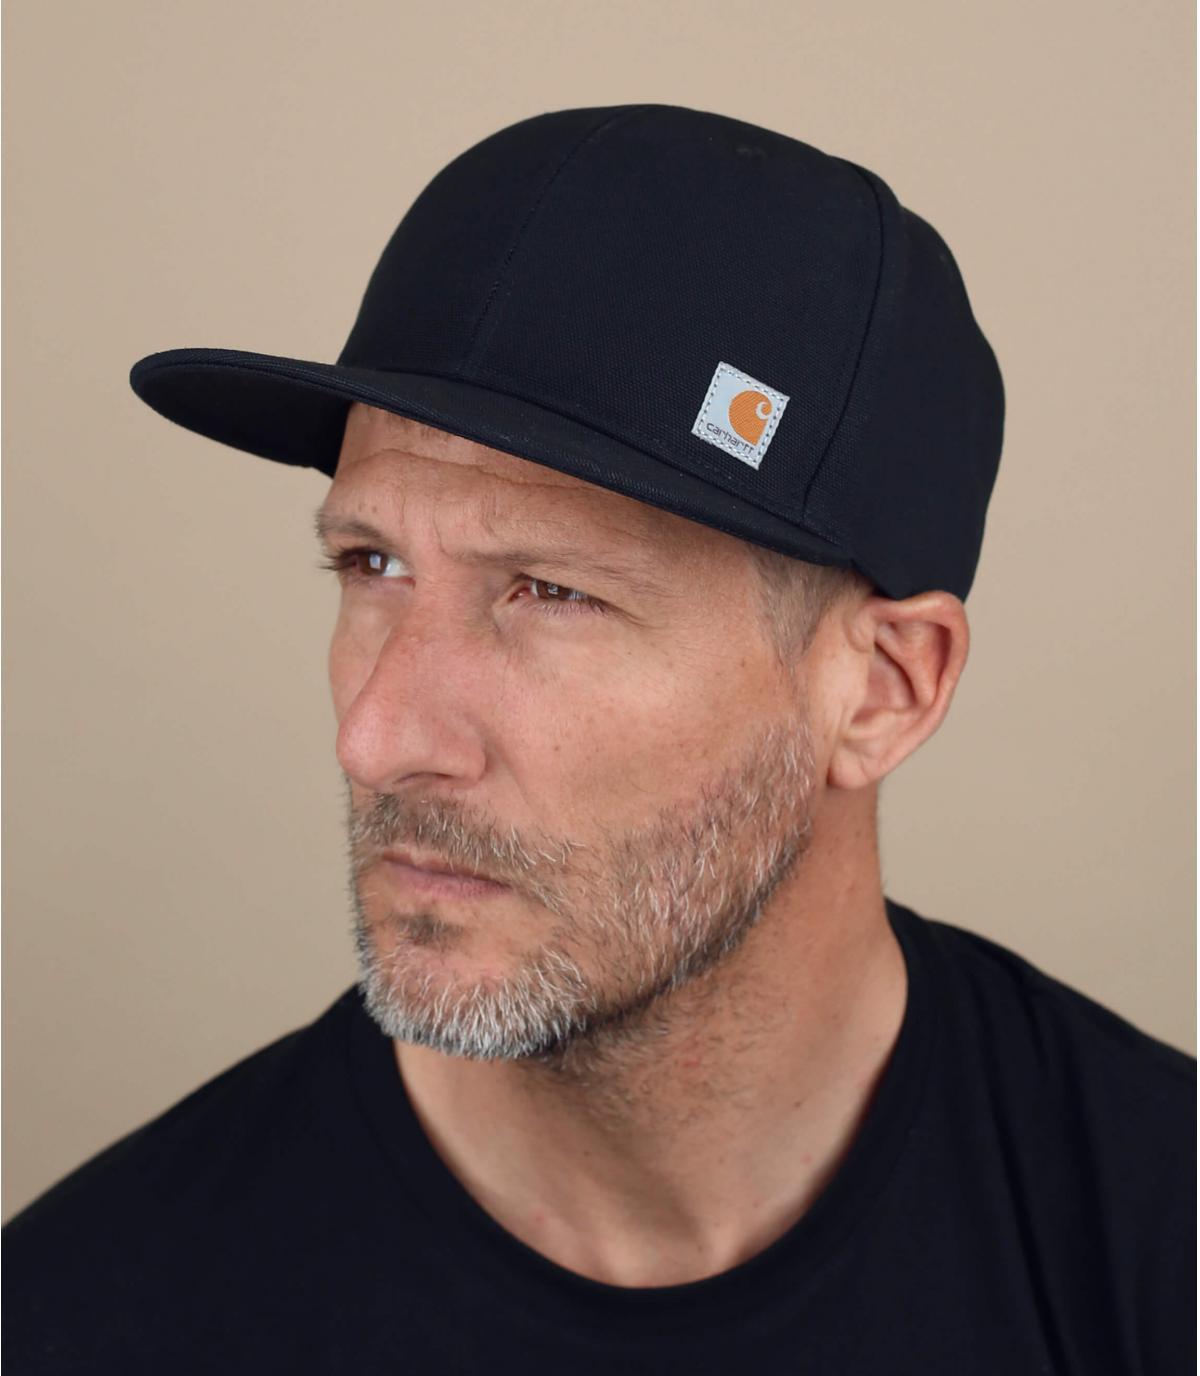 cappellino Carhartt nero